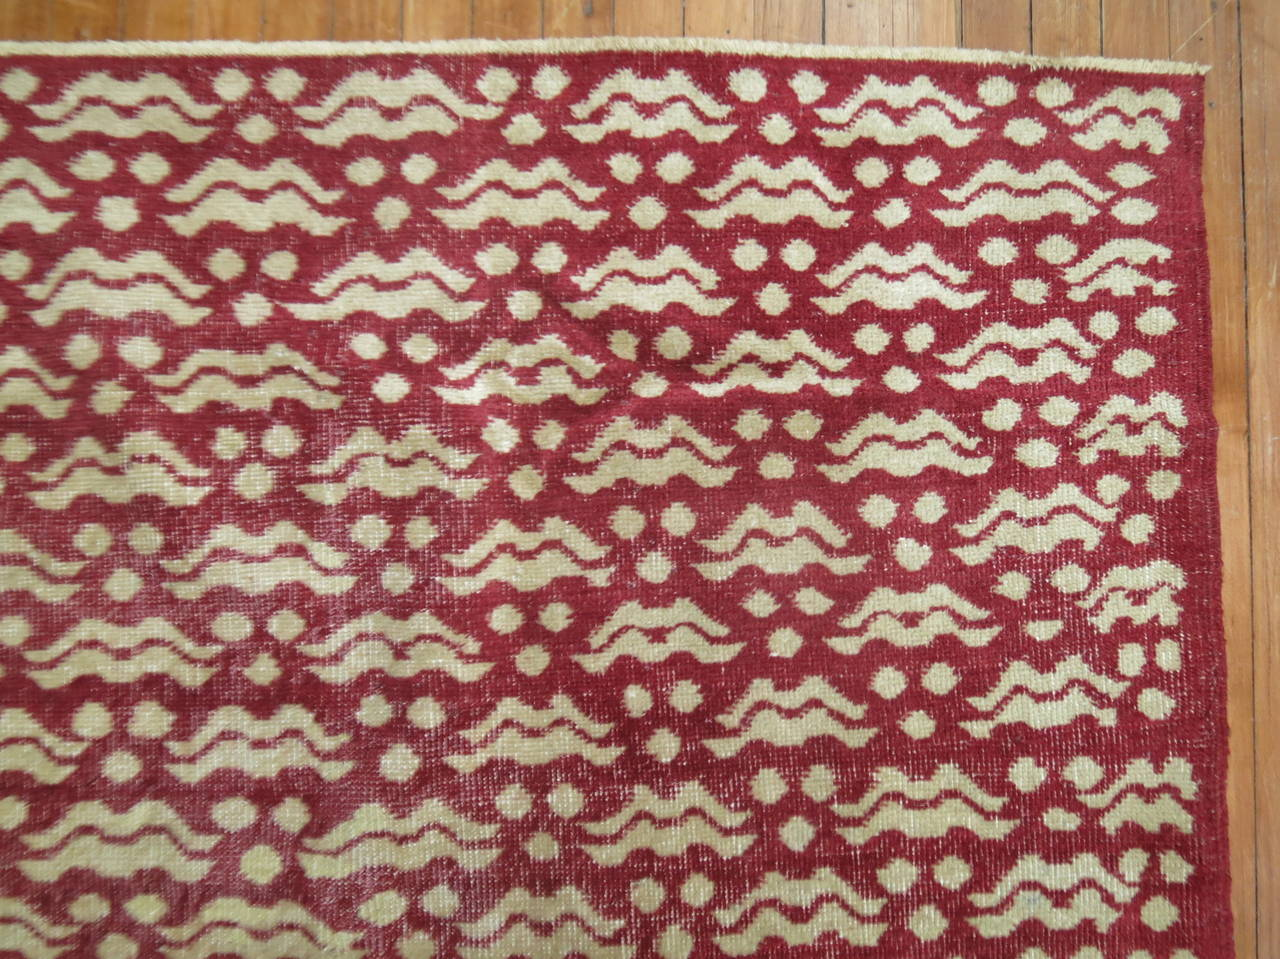 Midcentury Turkish deco rug in crimson red.